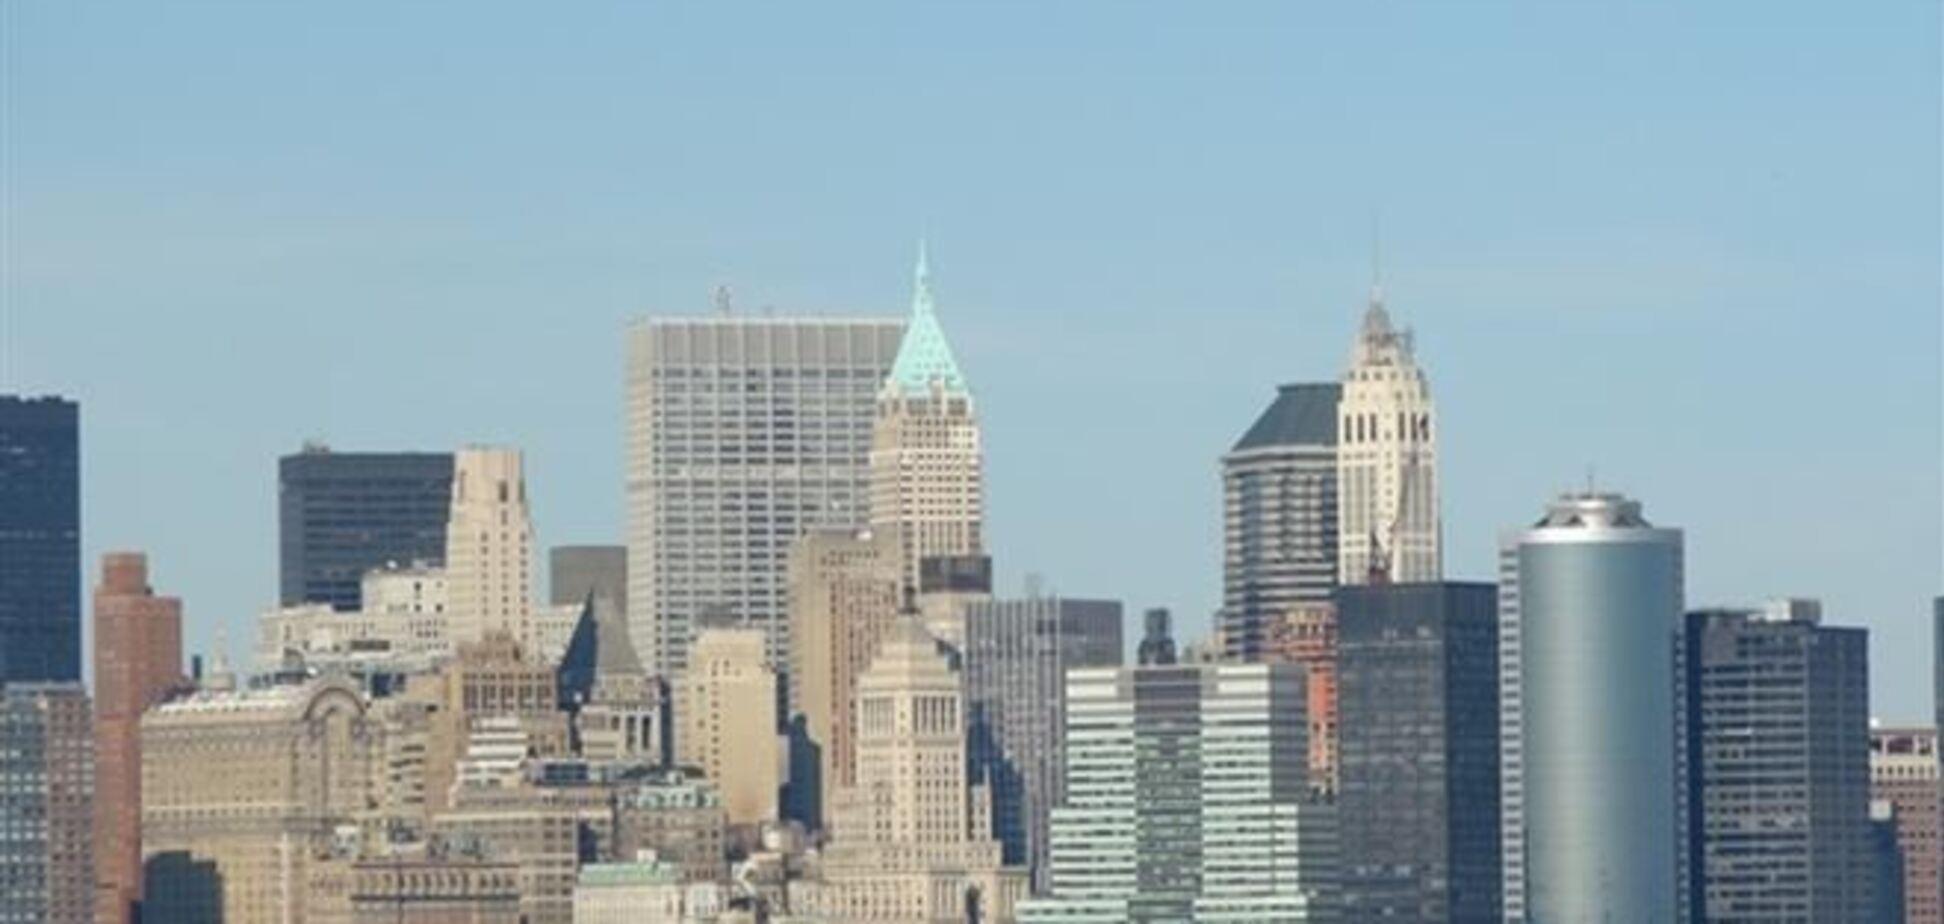 Аренда на Манхэттене подешевела впервые за два года